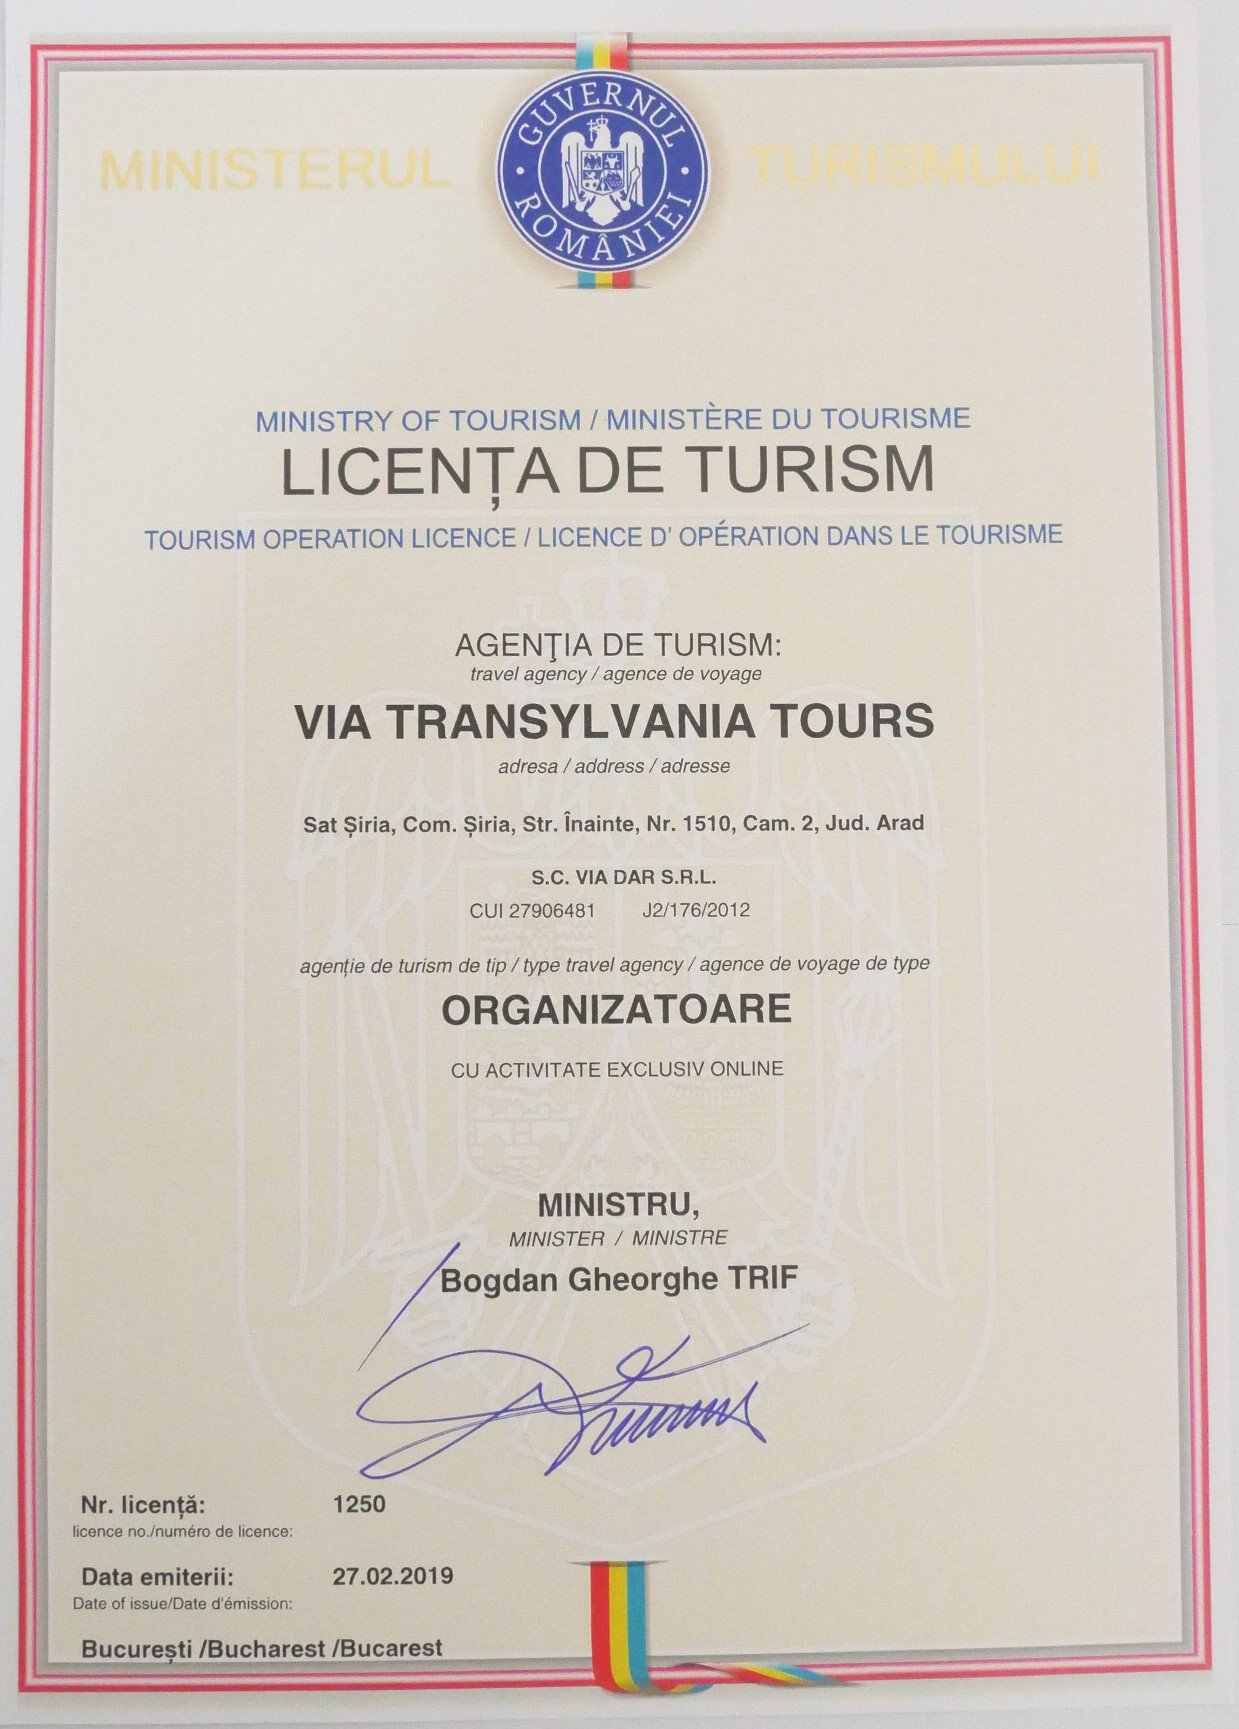 Romania-tour-operator-company-Via-Transylvania-Tours-travel-agency-tourism-license